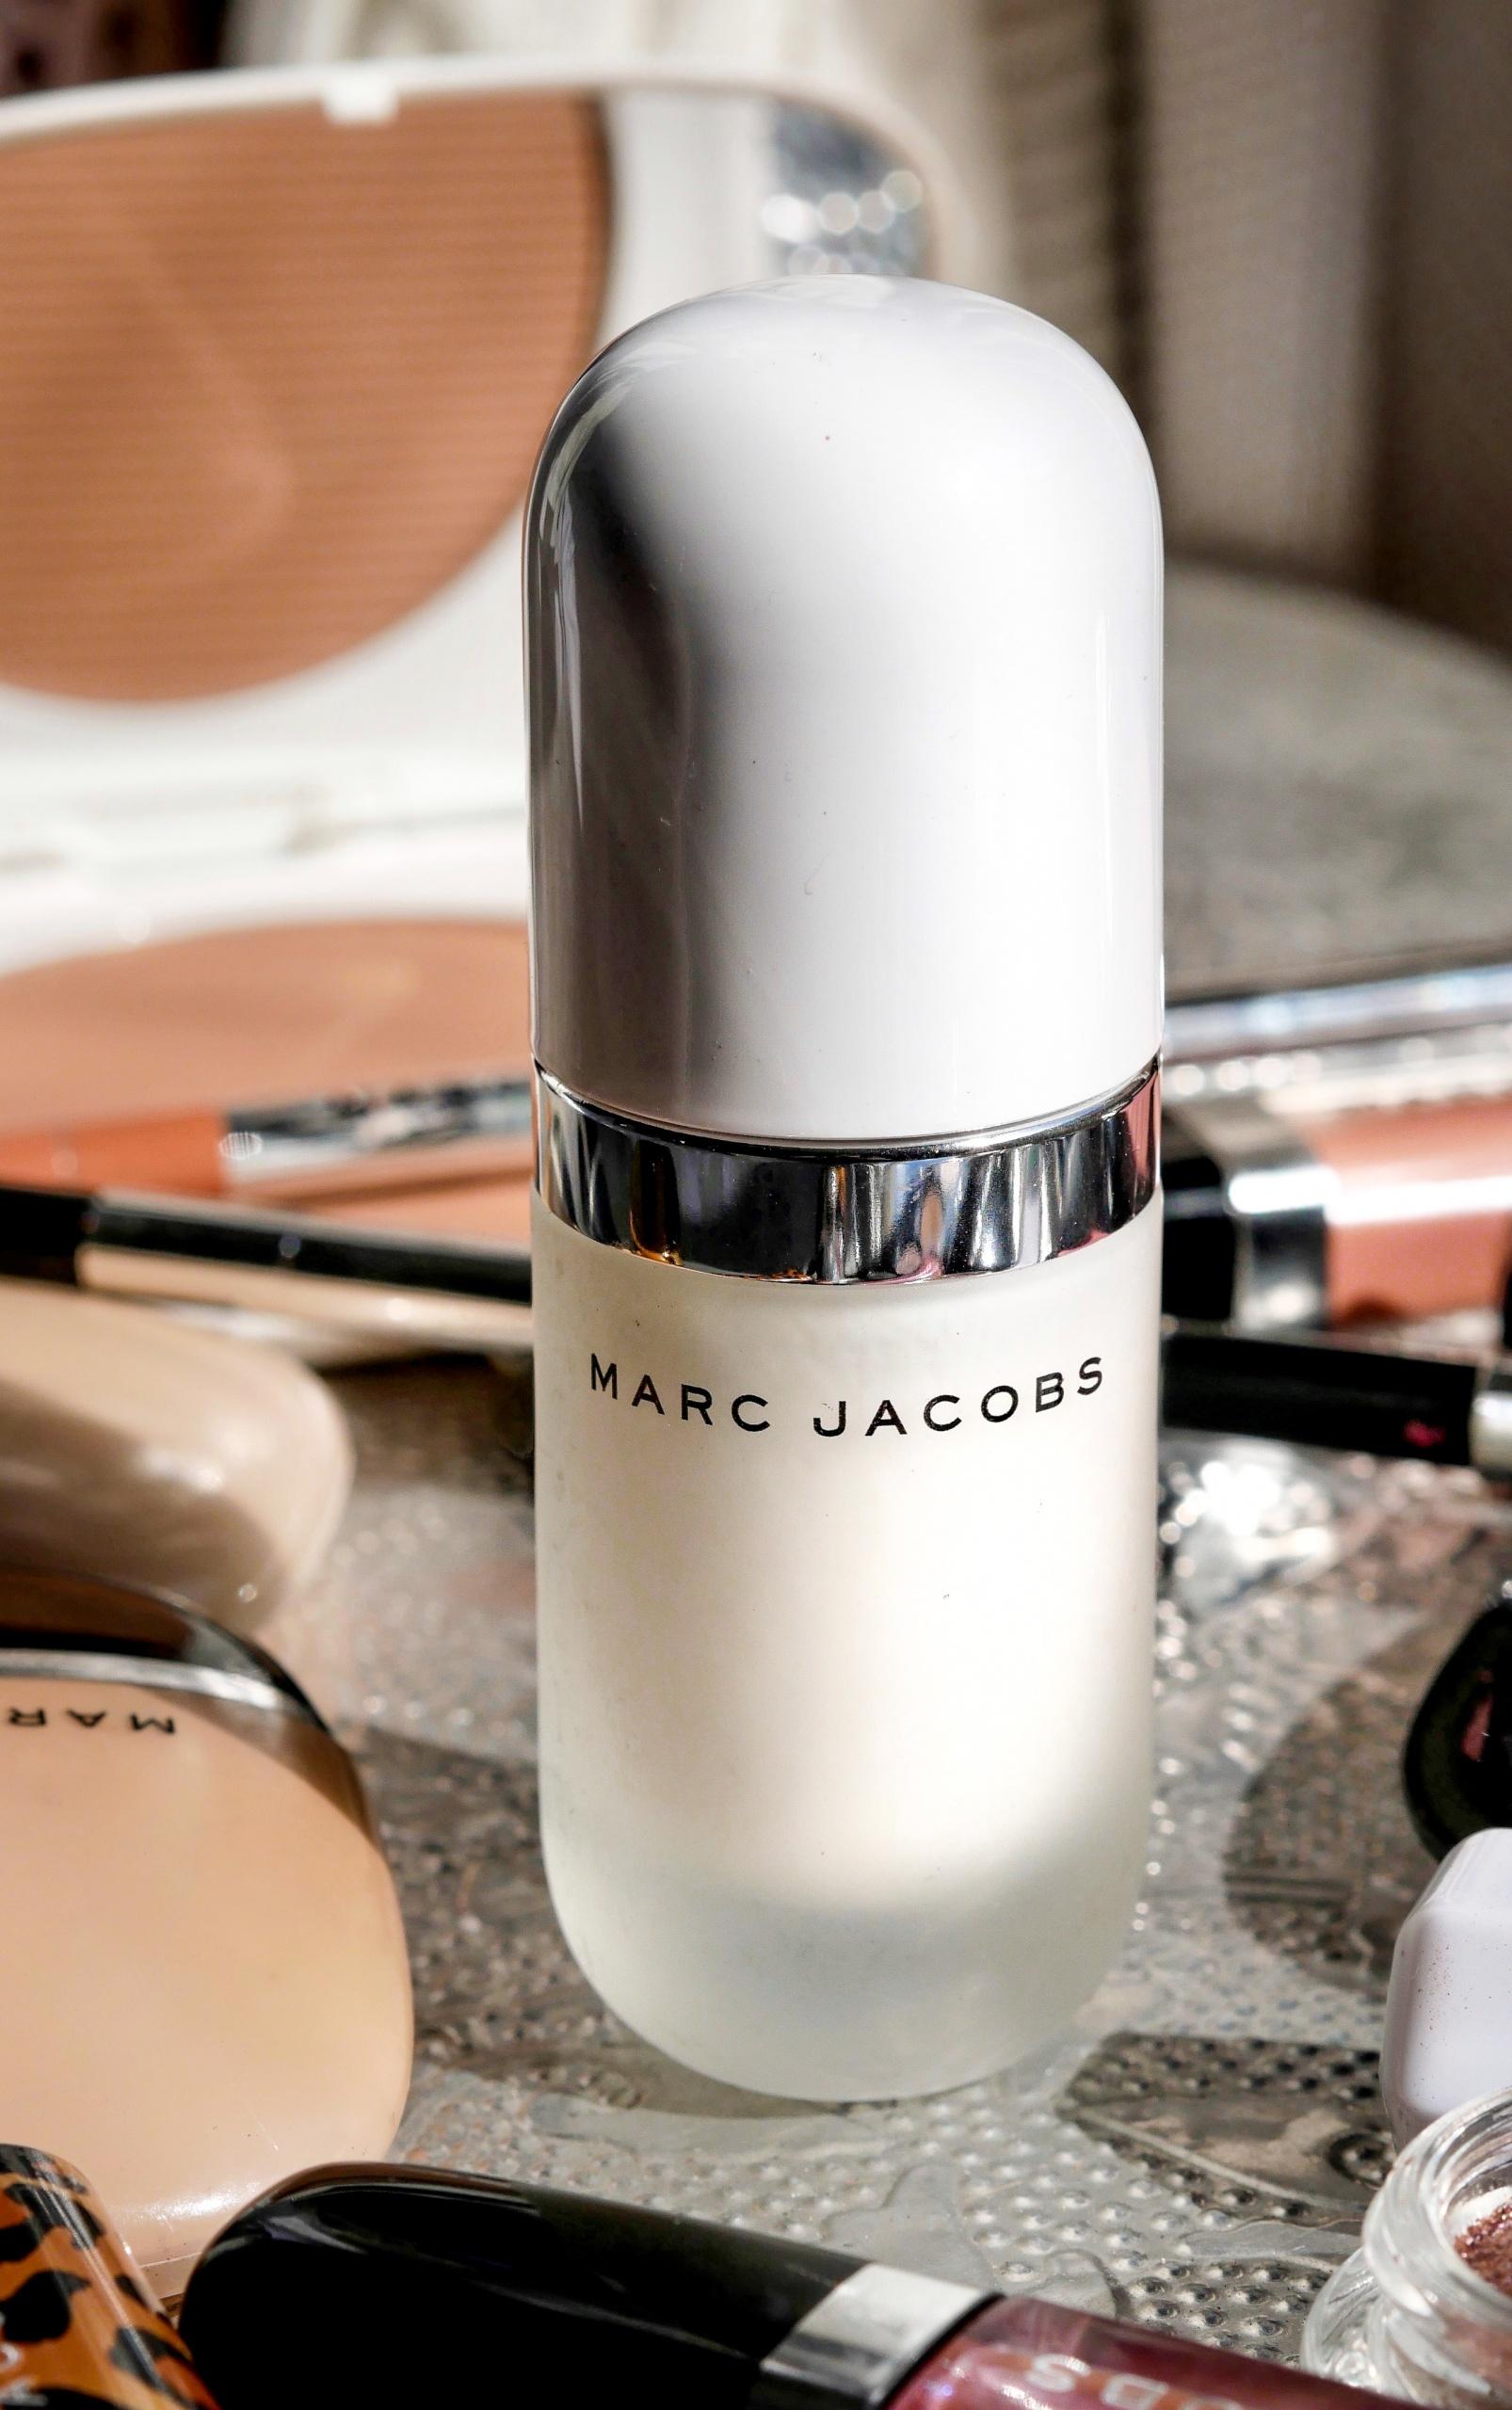 marc jacobs beauty, marc jacobs, makeup, cat eye , harvey nichols, marc jacobs mascara, marc jacobs foundation, marc jacobs